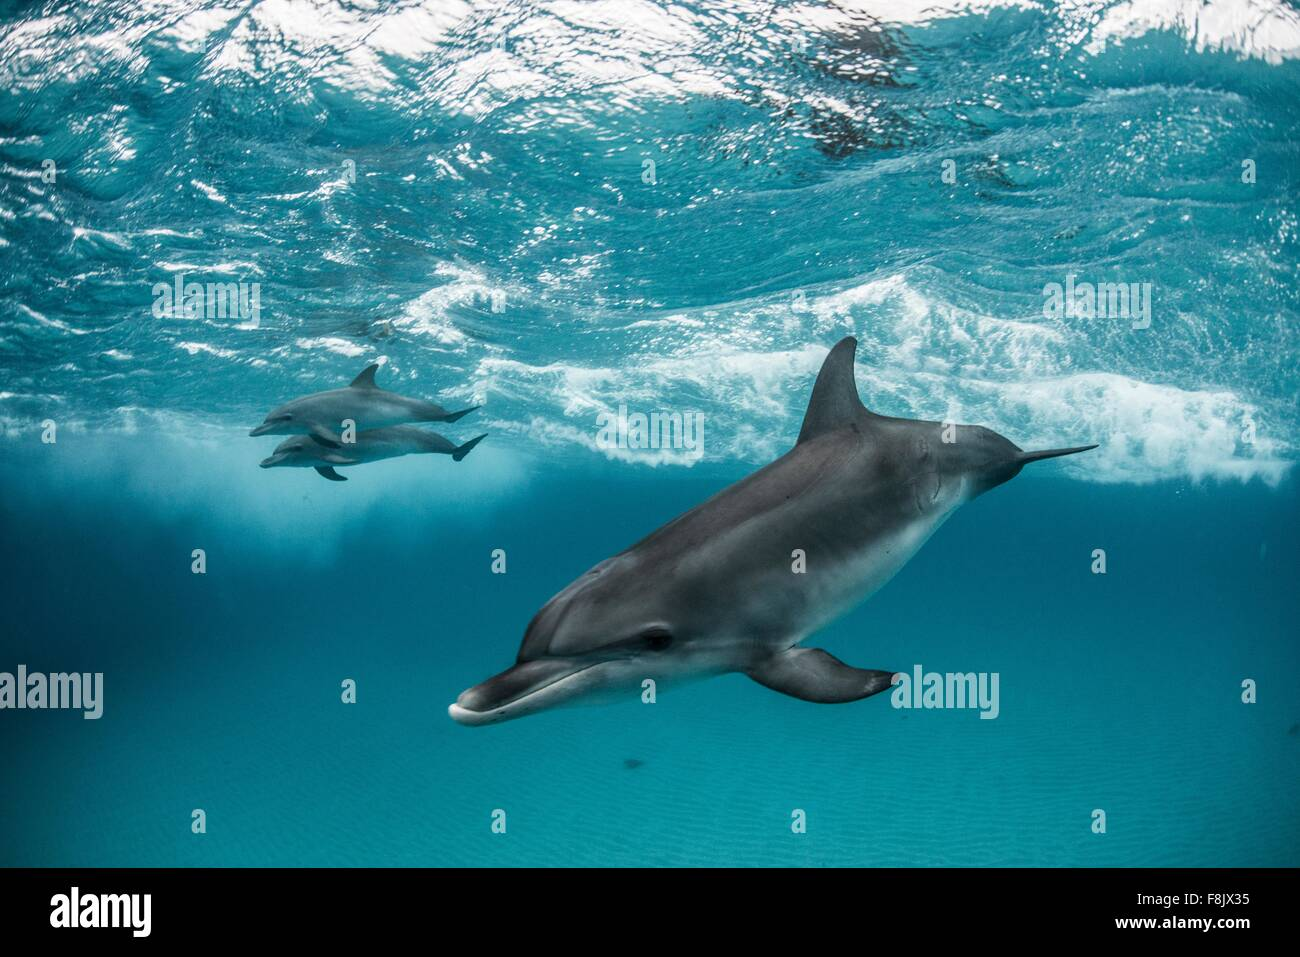 Atlantic delfini maculati surf sulle onde, guardando la telecamera, settentrionale Bahamas banche, Bahamas Immagini Stock